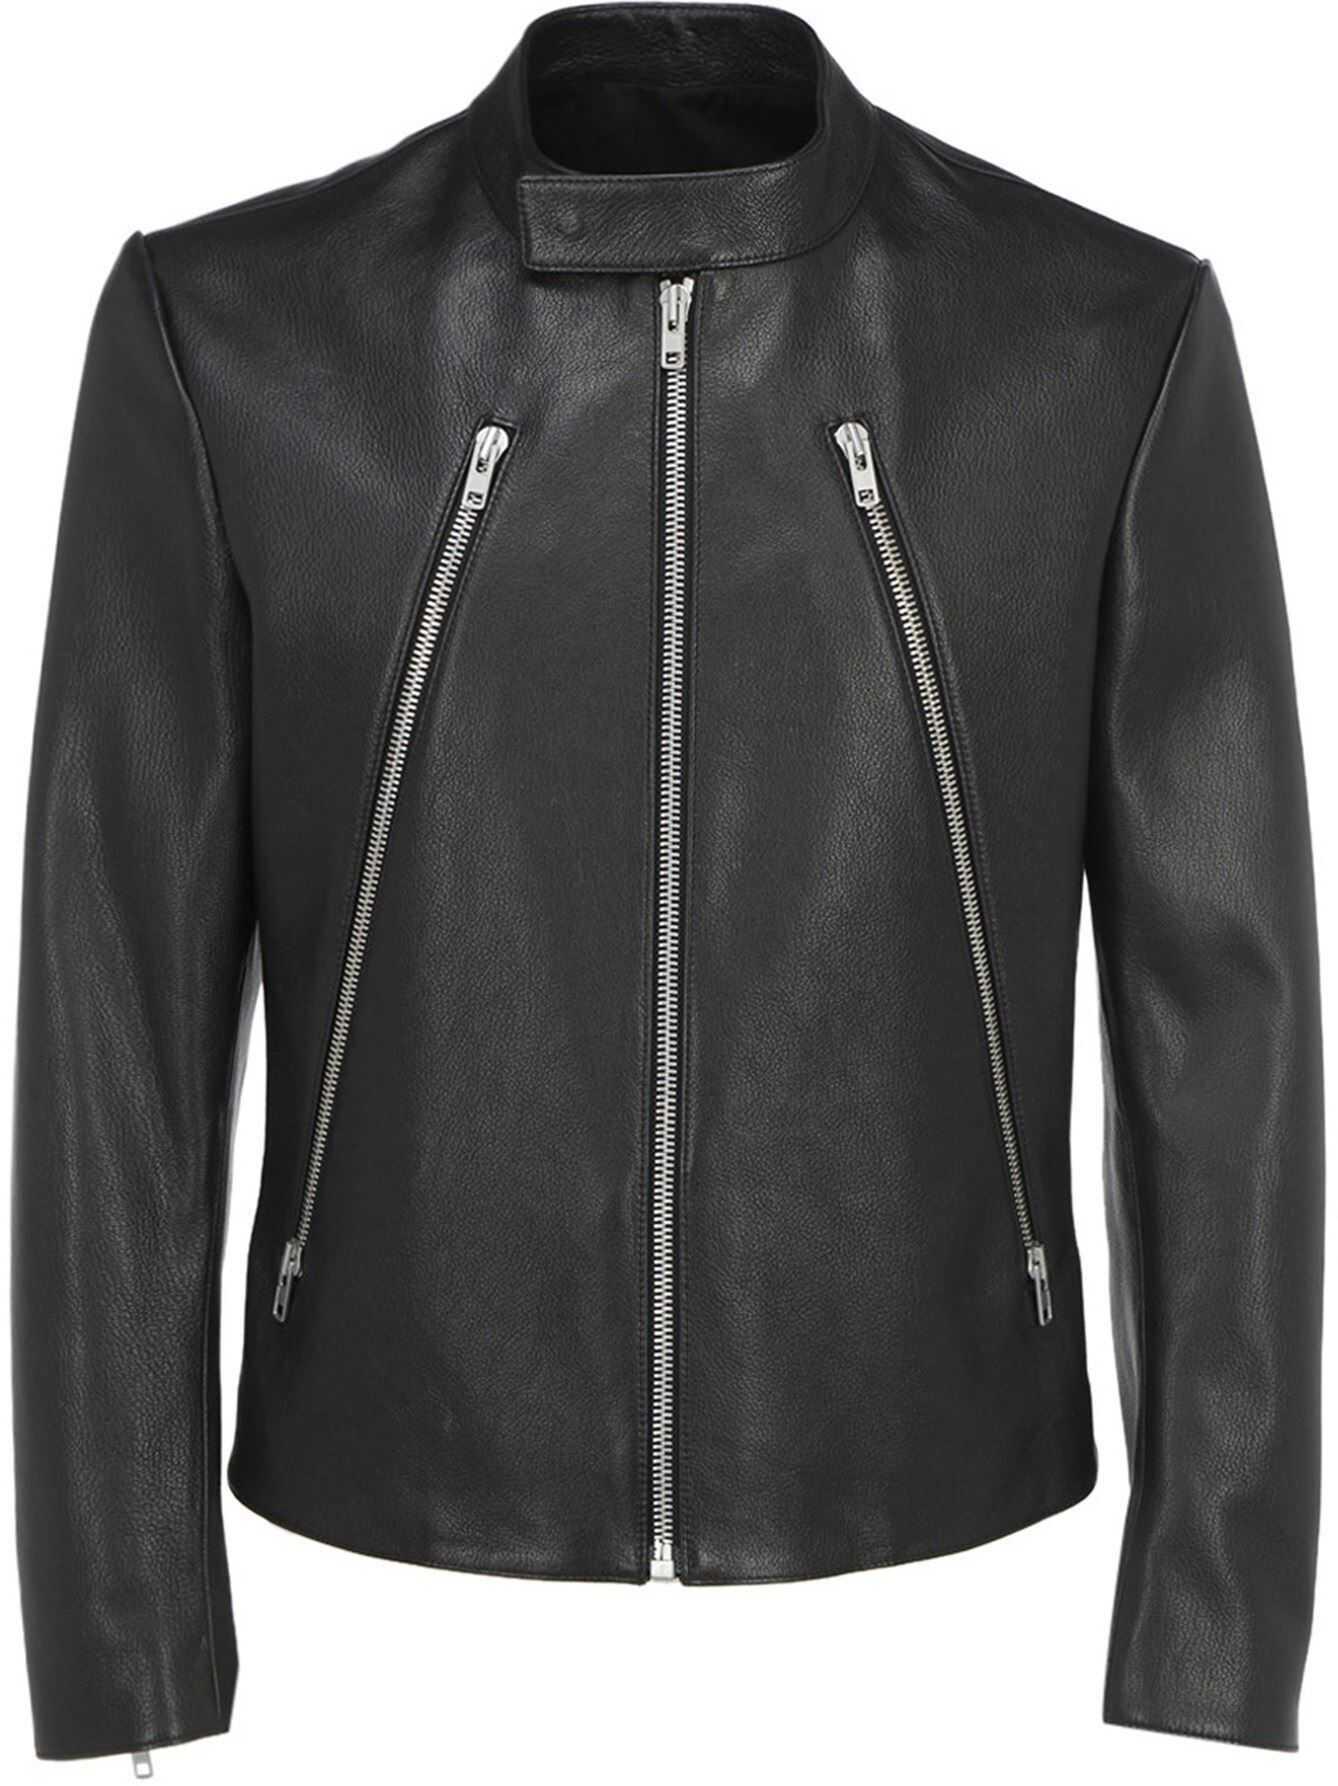 Maison Margiela Leather Biker Jacket In Black Black imagine